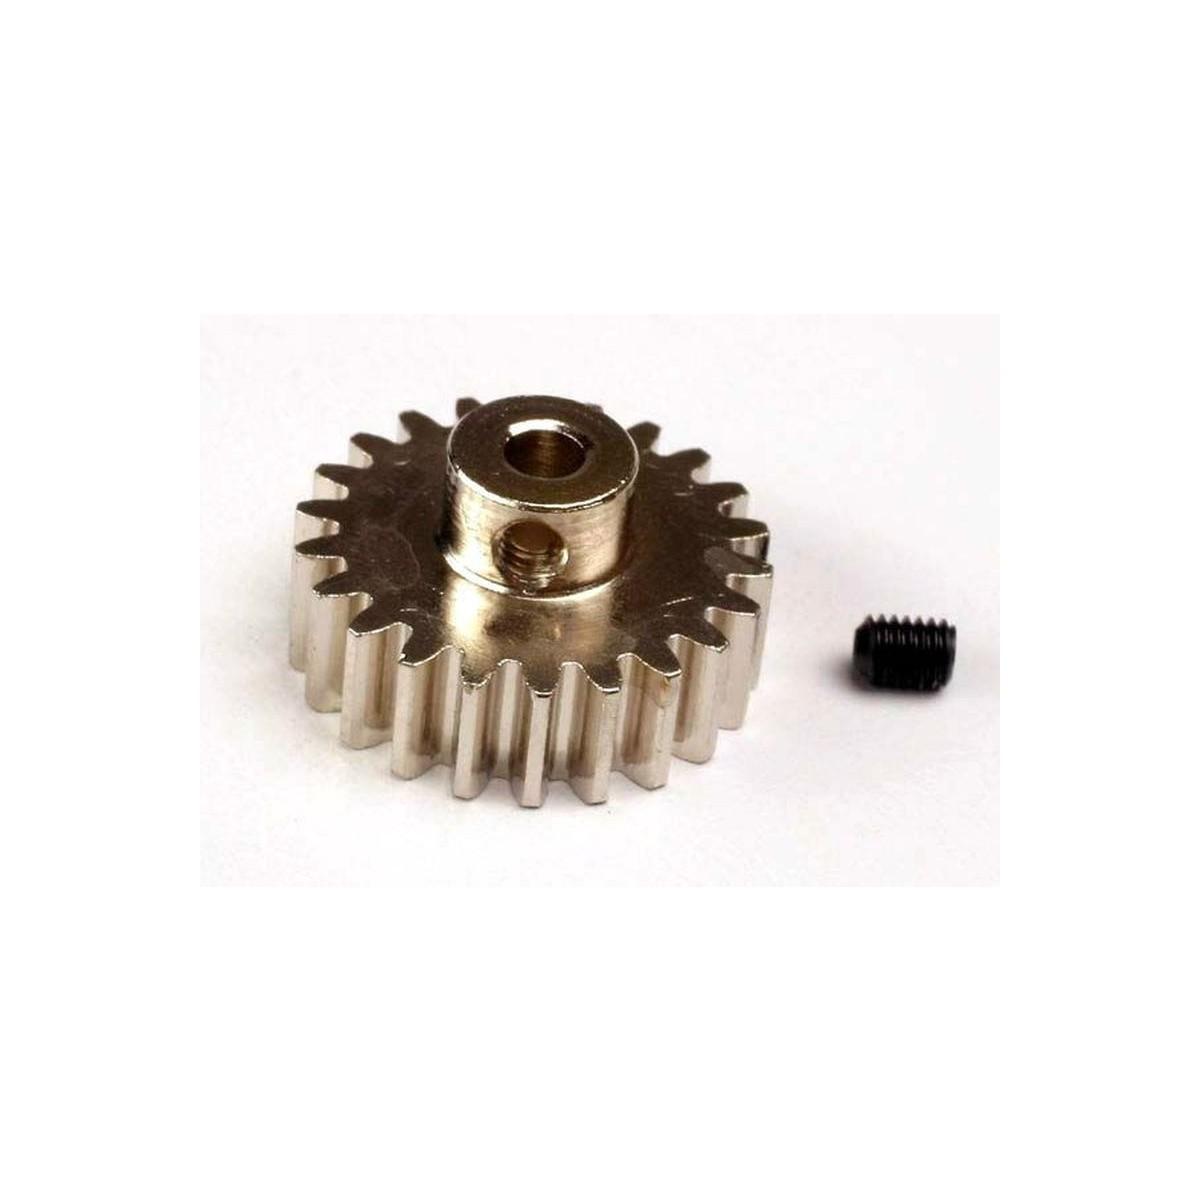 Stampede Rustler 4x4 VXL Traxxas Motorritzel 22 Zähne 32dp TRX3952 Slash 4x4